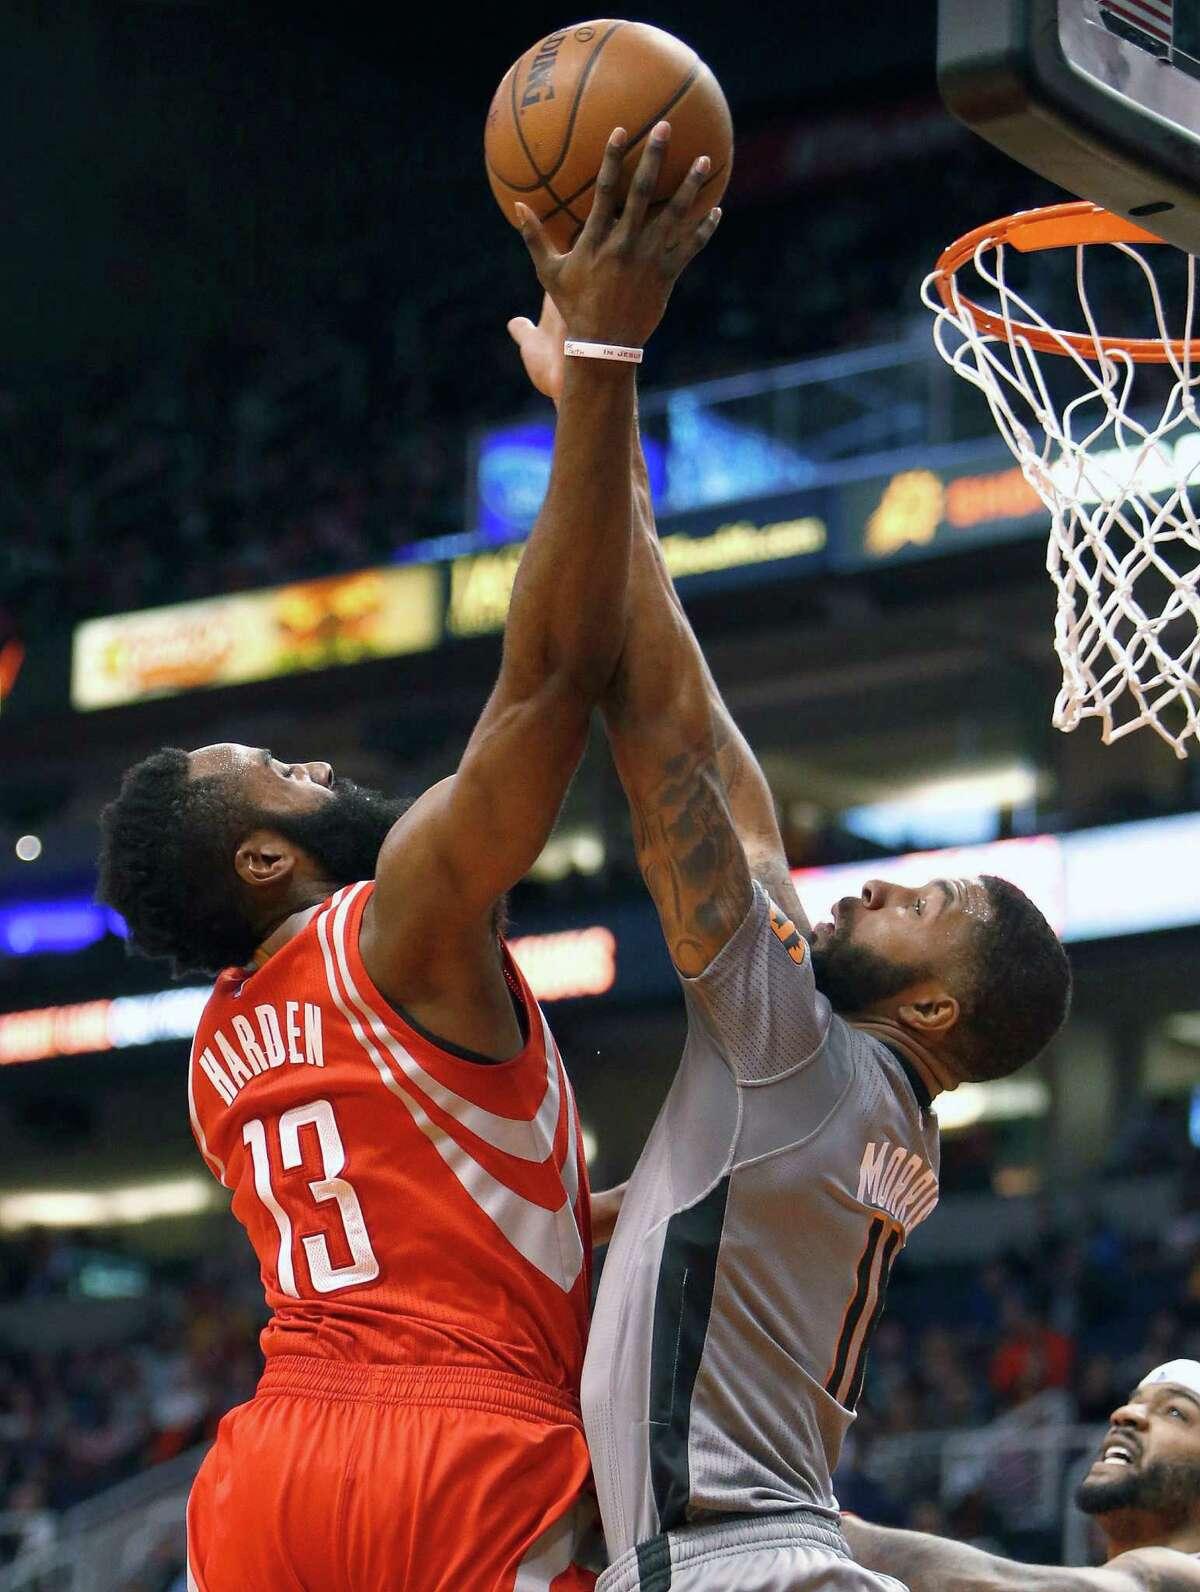 Houston Rockets guard James Harden (13) draws the foul on Phoenix Suns forward Markieff Morris during the second quarter of an NBA basketball game Thursday, Feb. 4, 2016, in Phoenix. (AP Photo/Rick Scuteri)